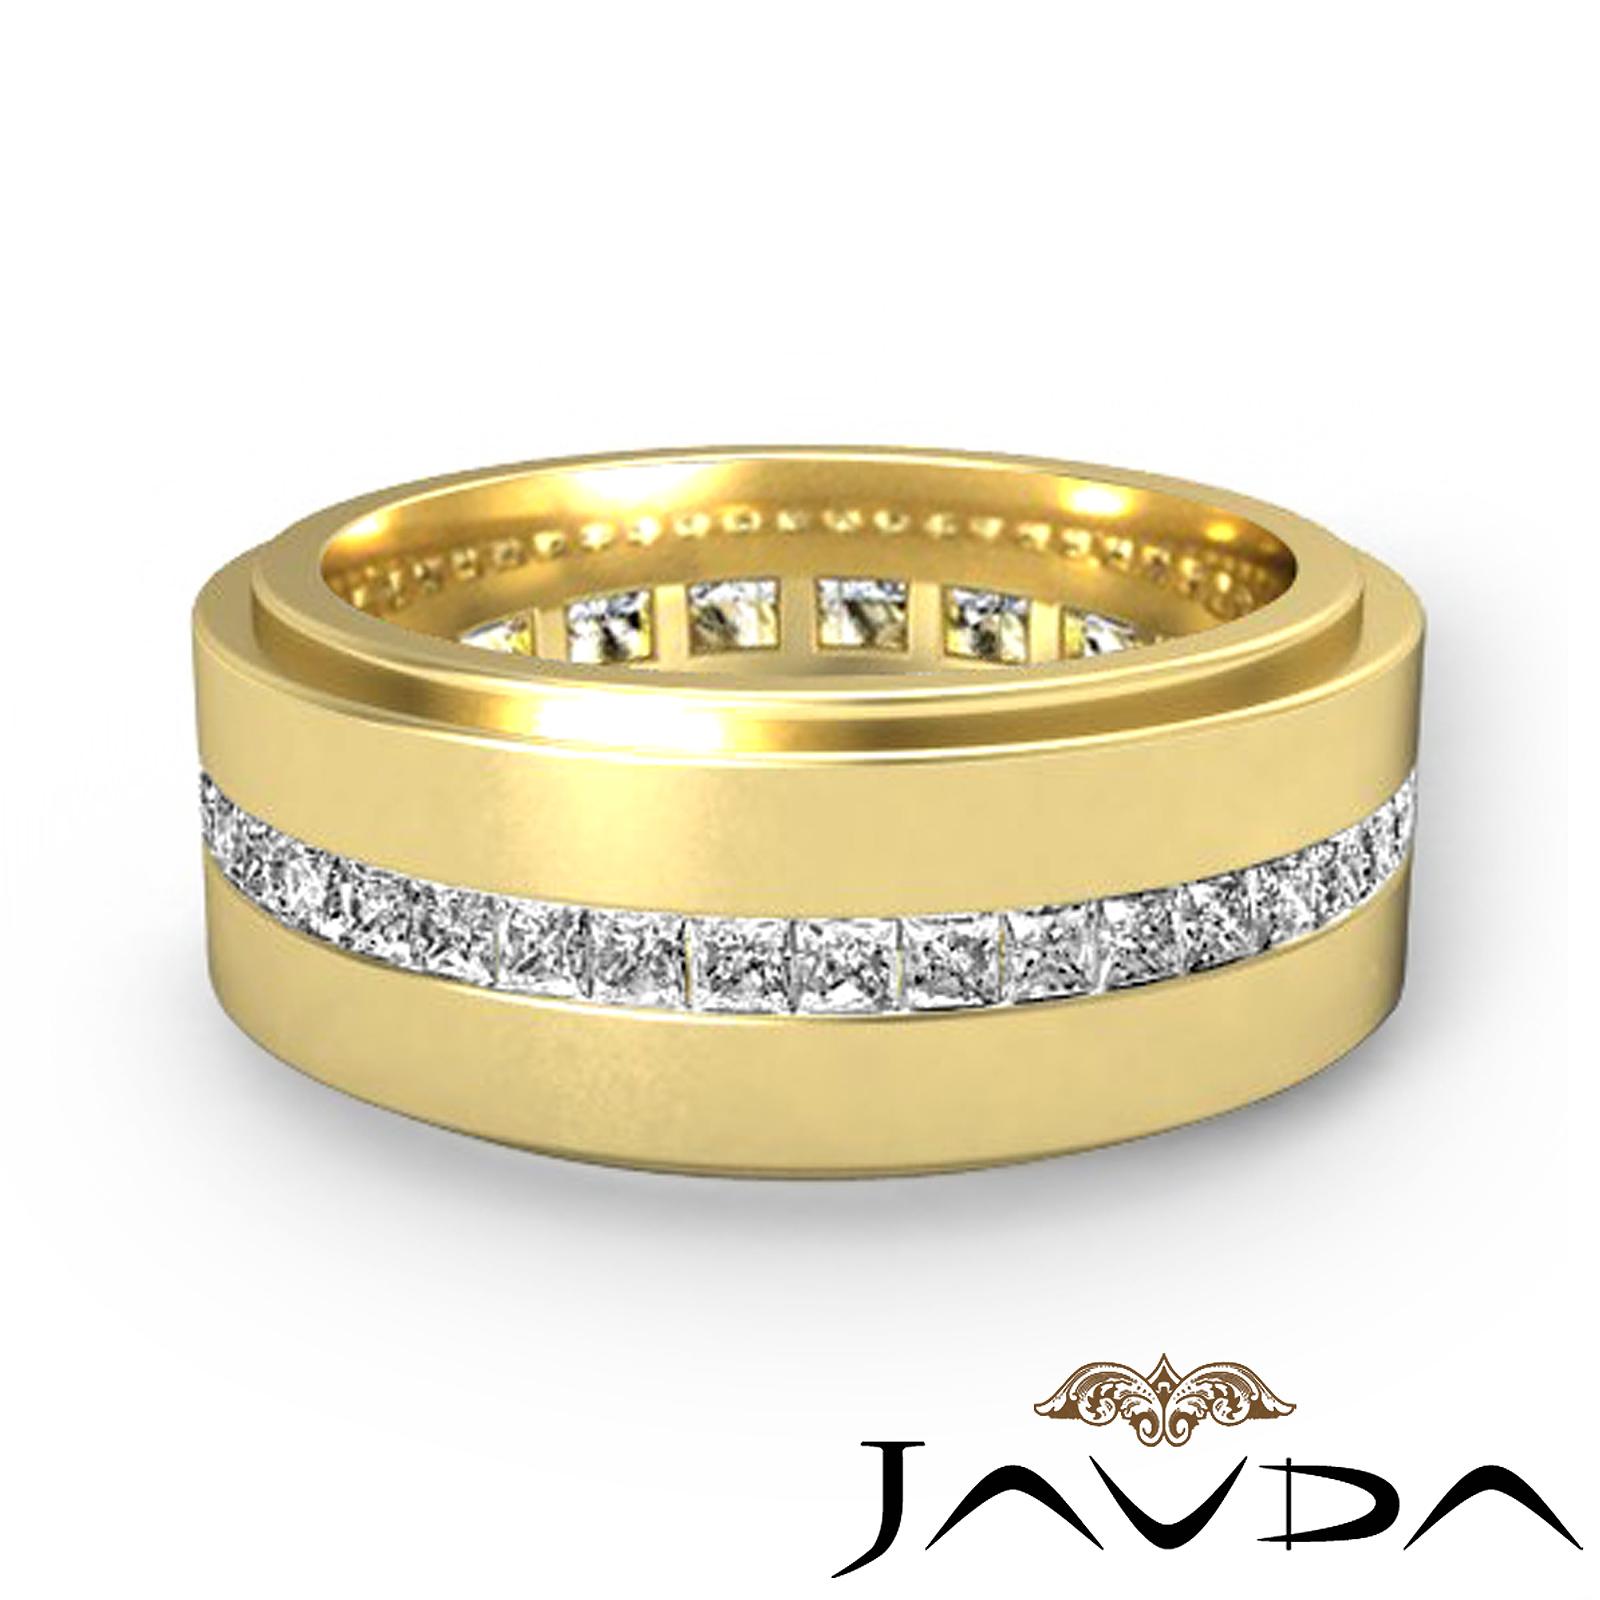 Channel Princess Diamond Ring 18k Yellow Gold Mens Eternity Wedding Band 17Ct